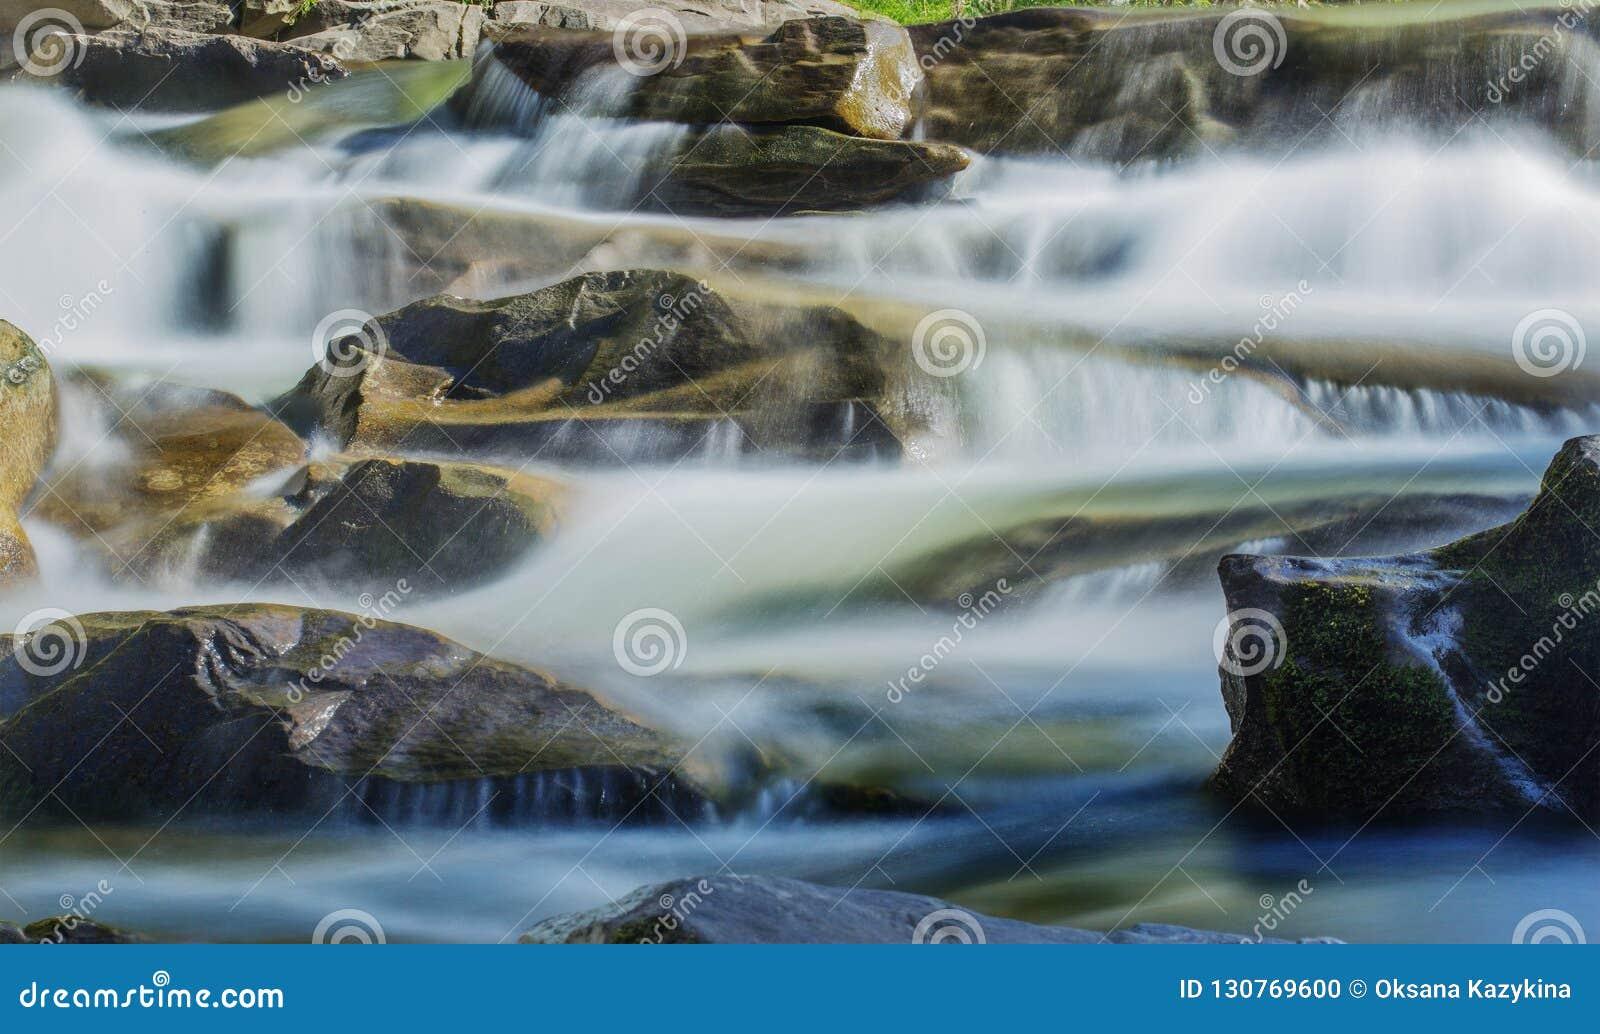 Big rocks in waterfalls of mountains river mountains. Water mountains landscape. Idea for outdoor activities, travel.